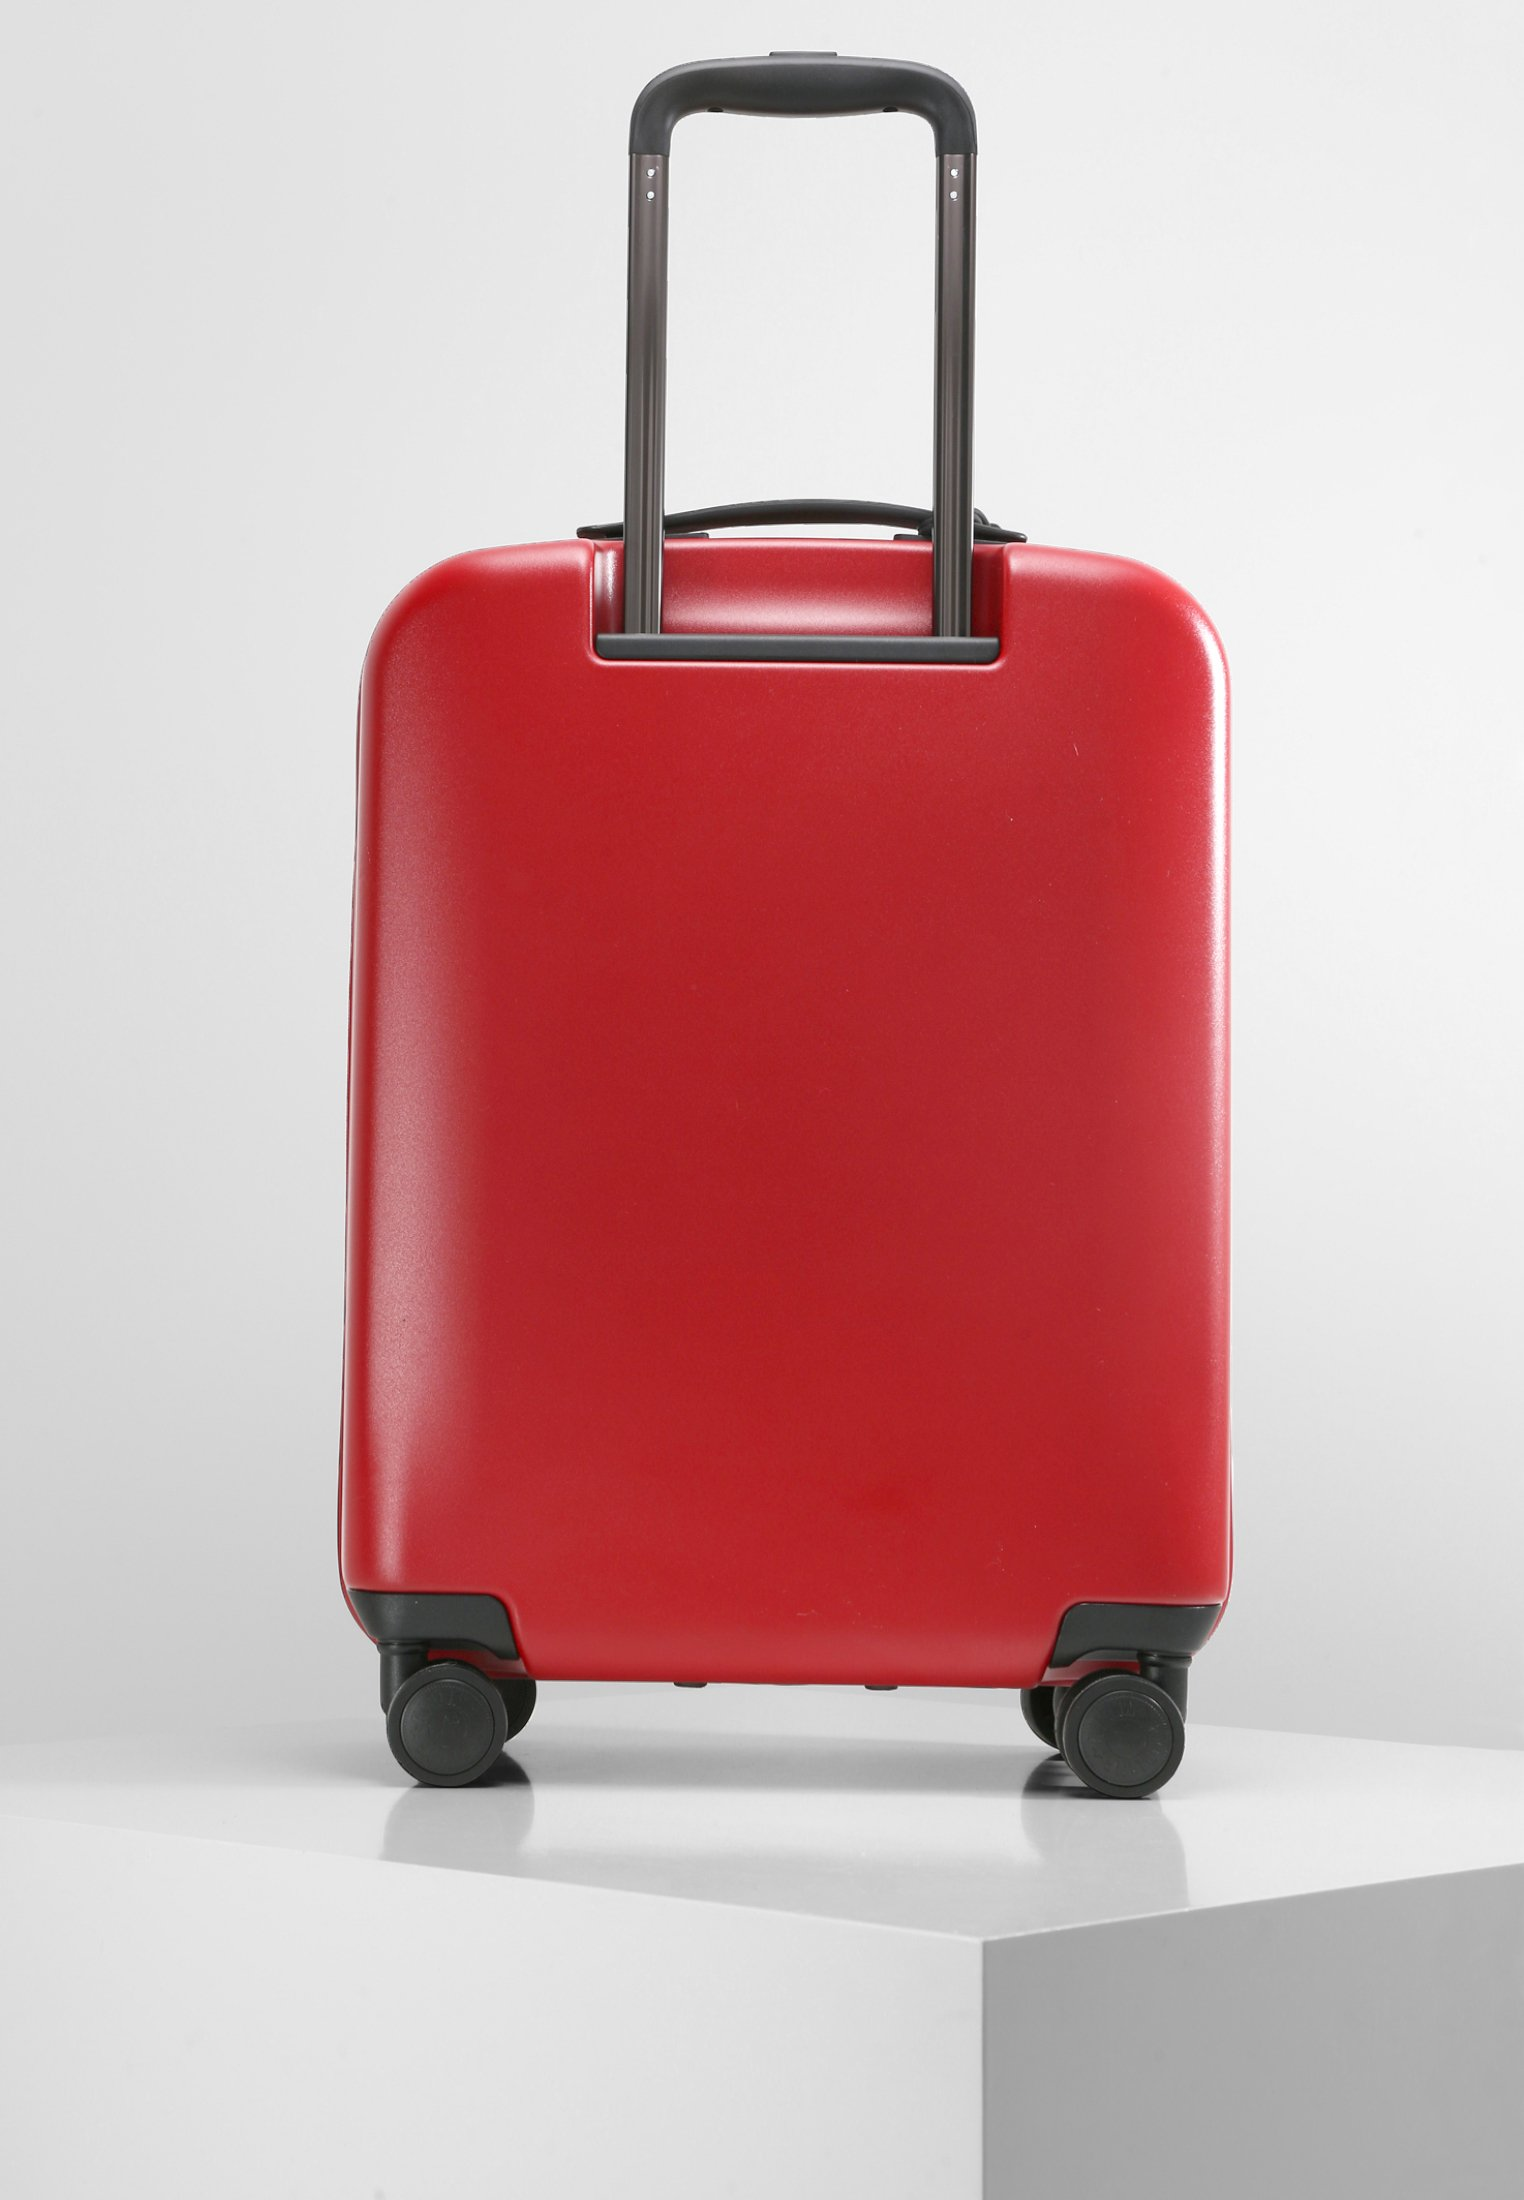 Kipling Valise à roulettes - lively red